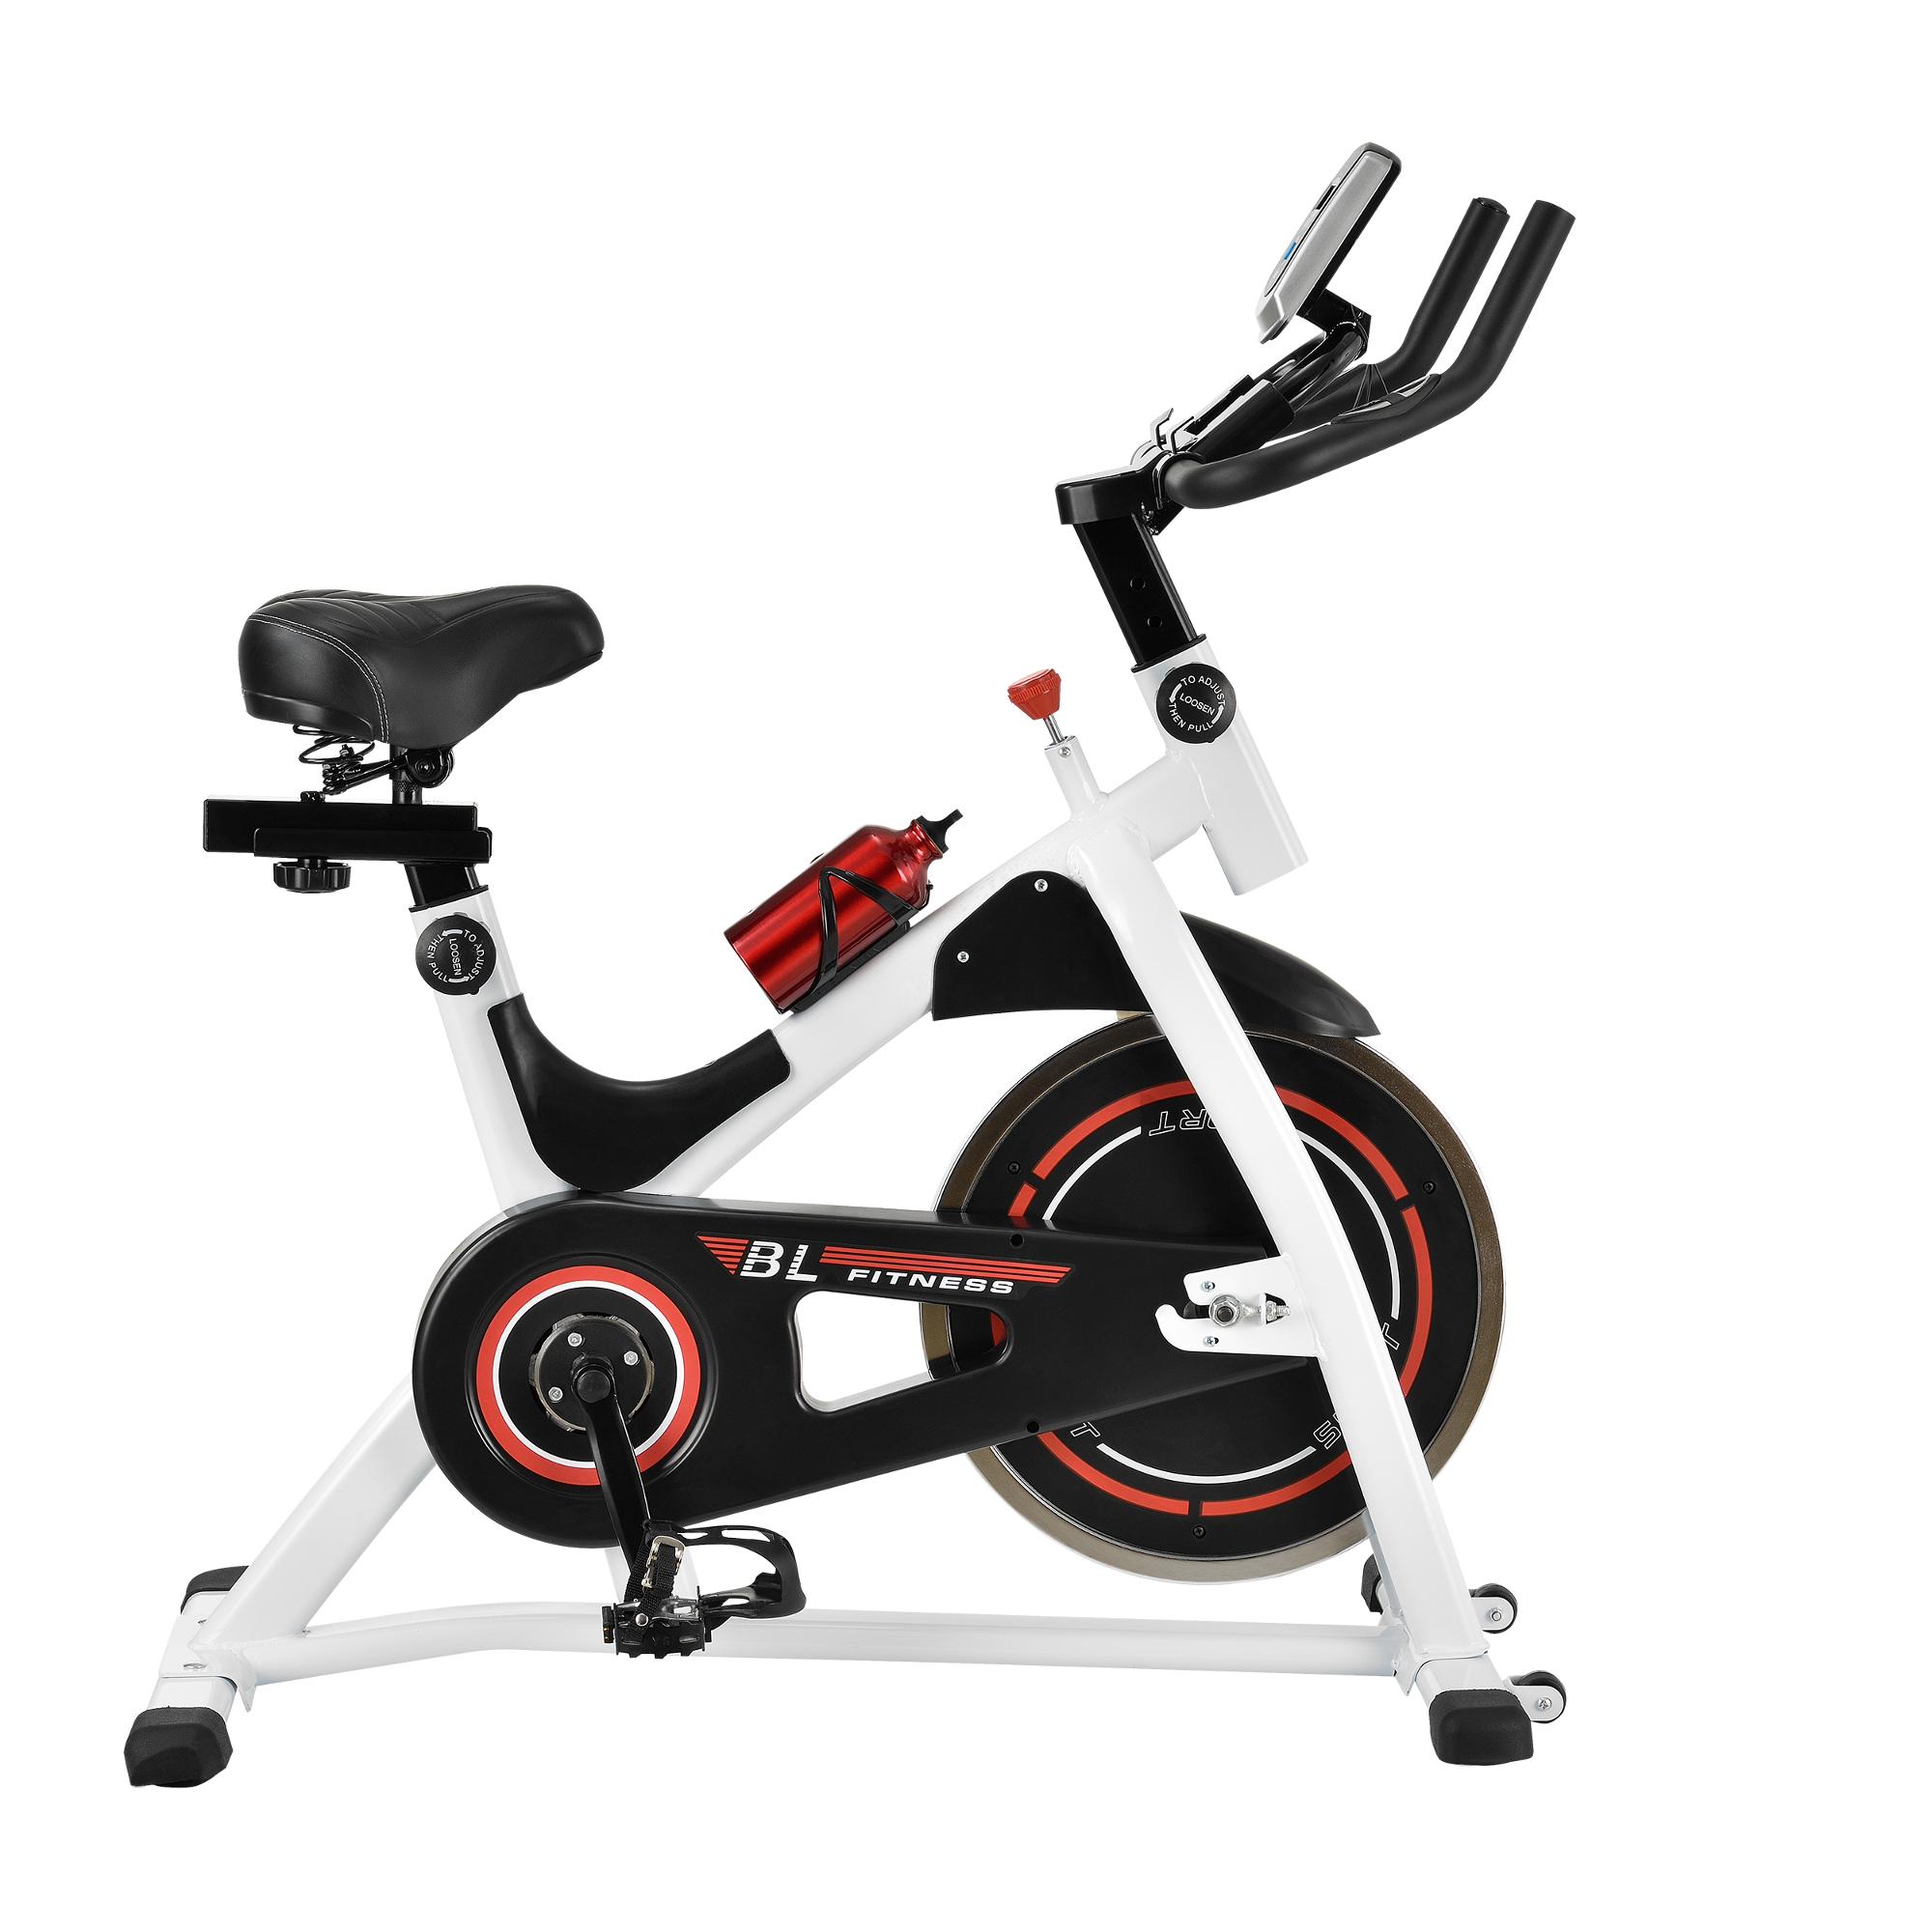 heimtrainer fahrrad fitness bike trimmrad indoor cycling rad sattel ebay. Black Bedroom Furniture Sets. Home Design Ideas